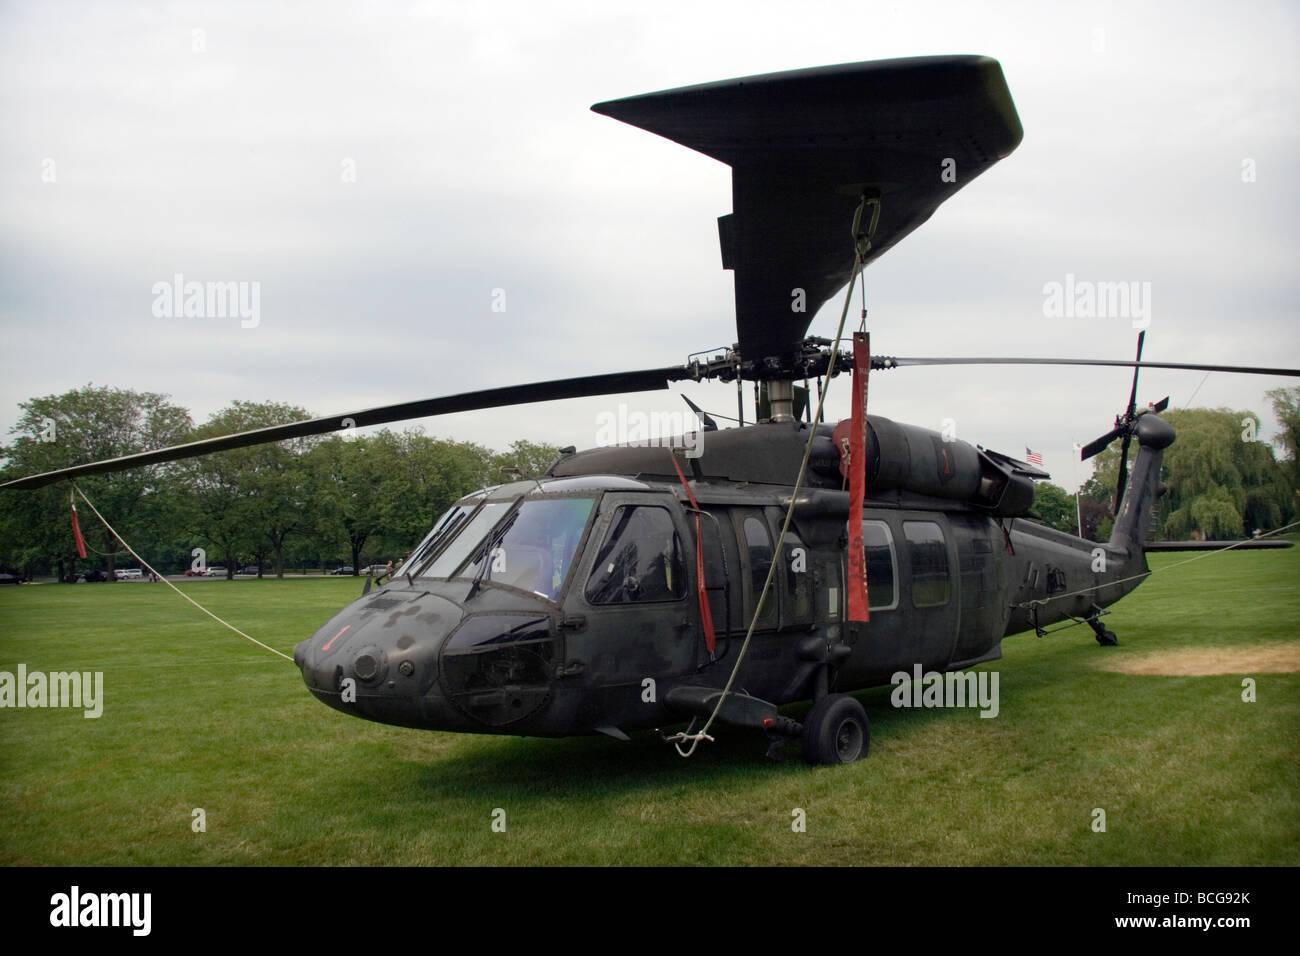 US Army Sikorsky UH-60 Black Hawk. At Cantigny park. Stock Photo